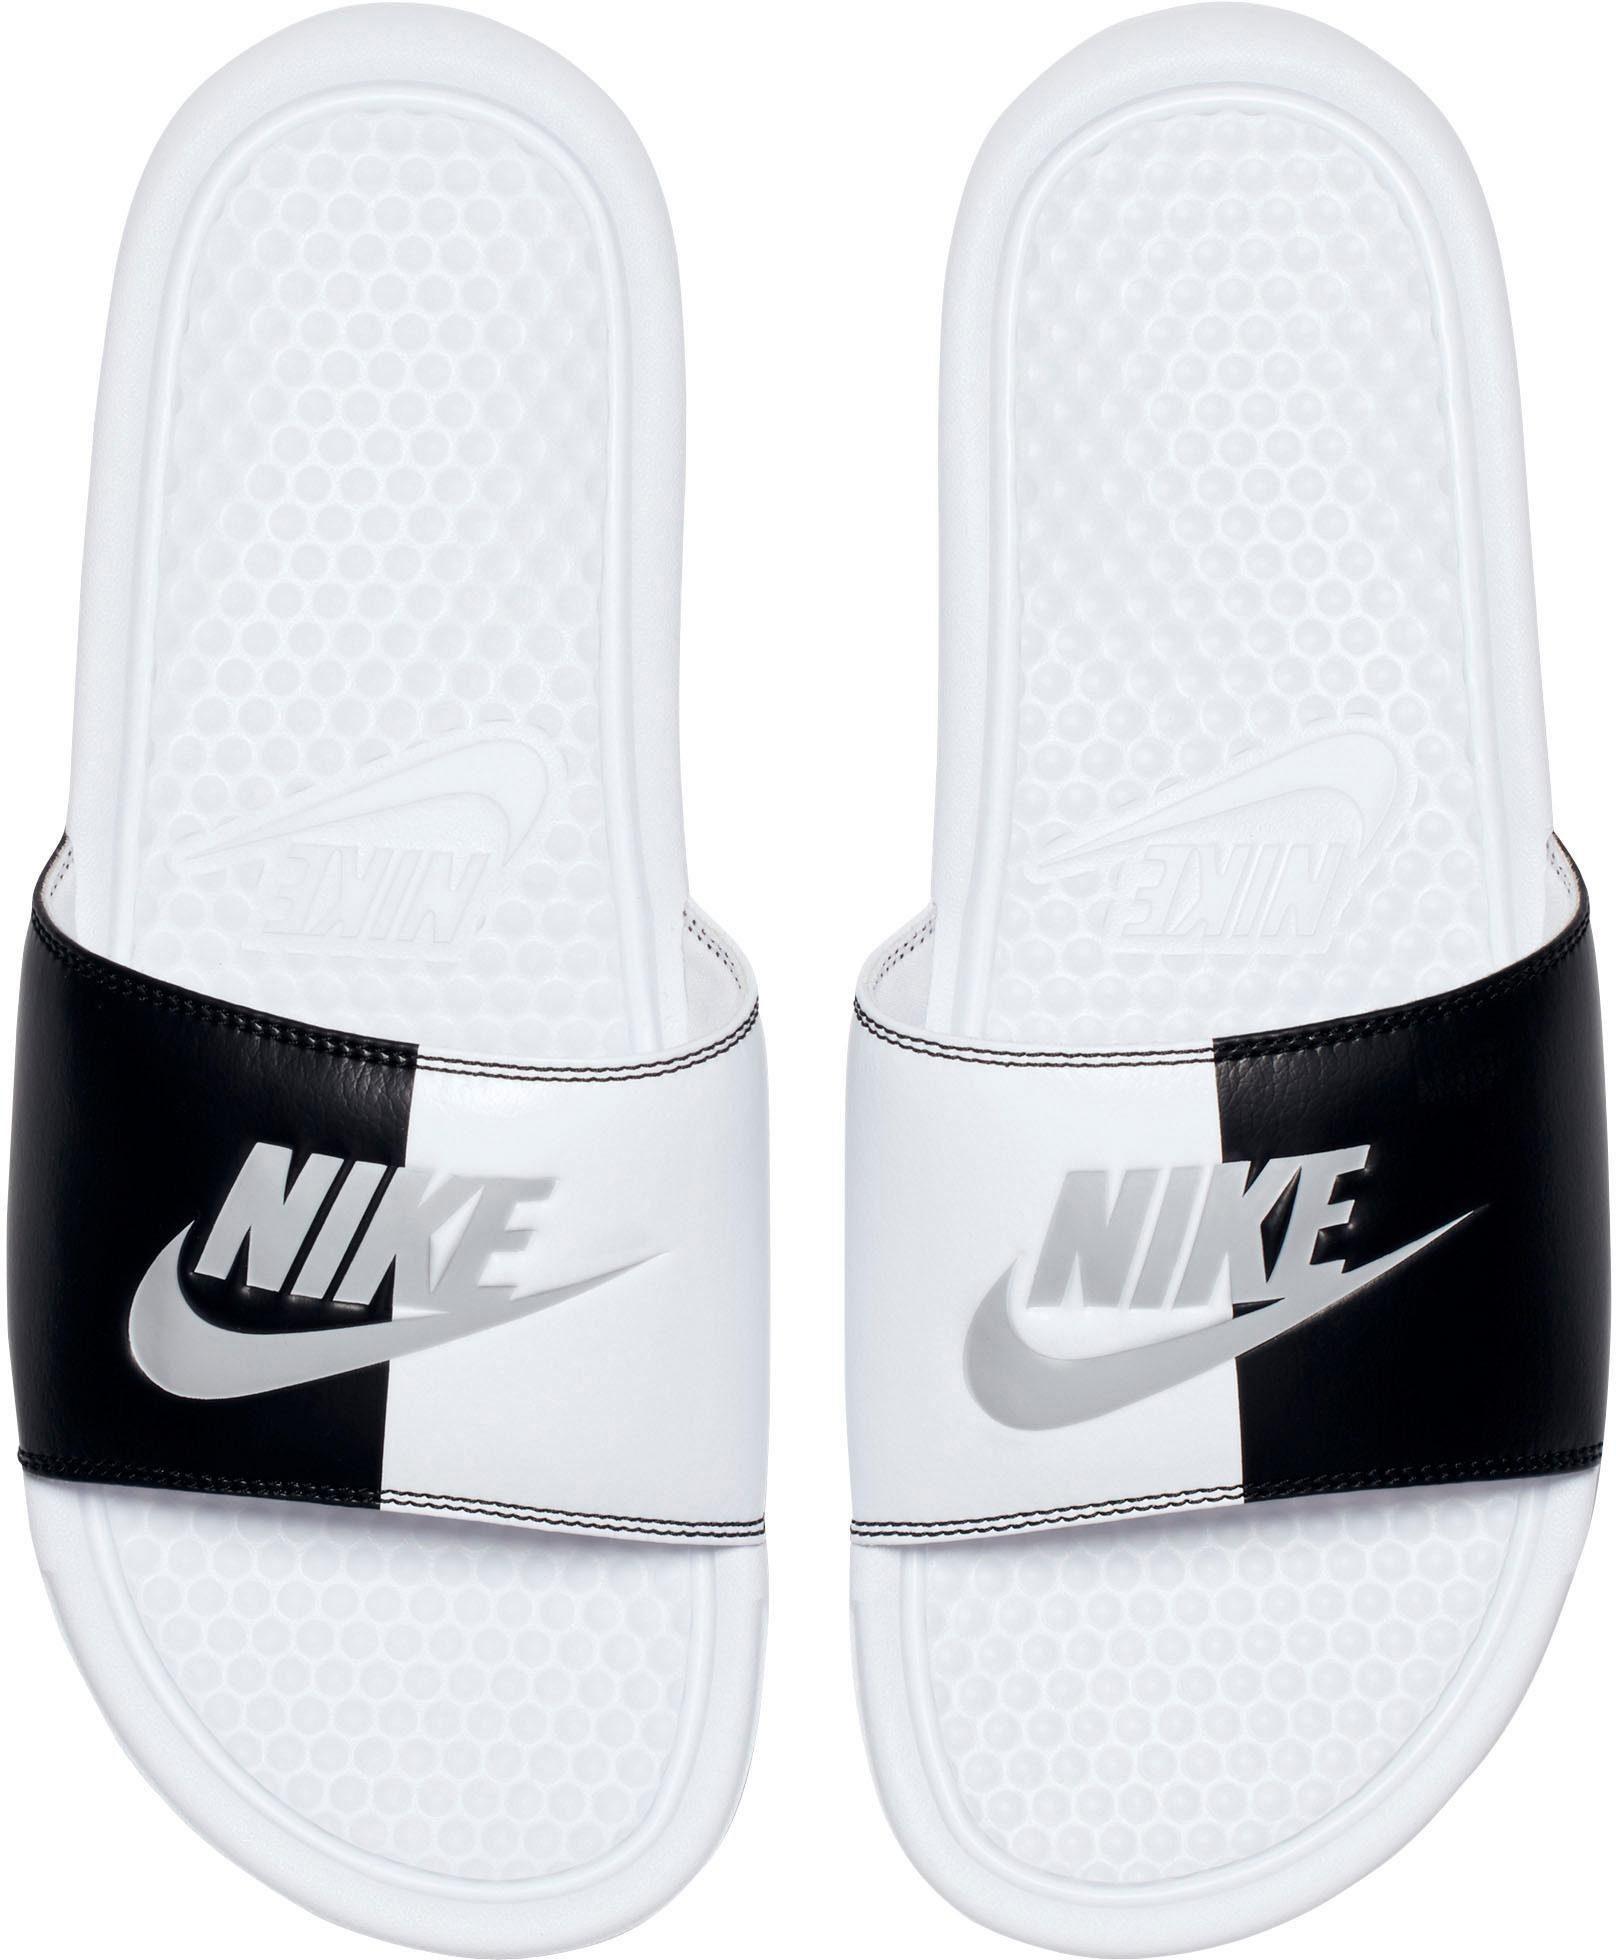 Nike Sportswear Wmns Benassi JDI Badesandale  weiß-schwarz